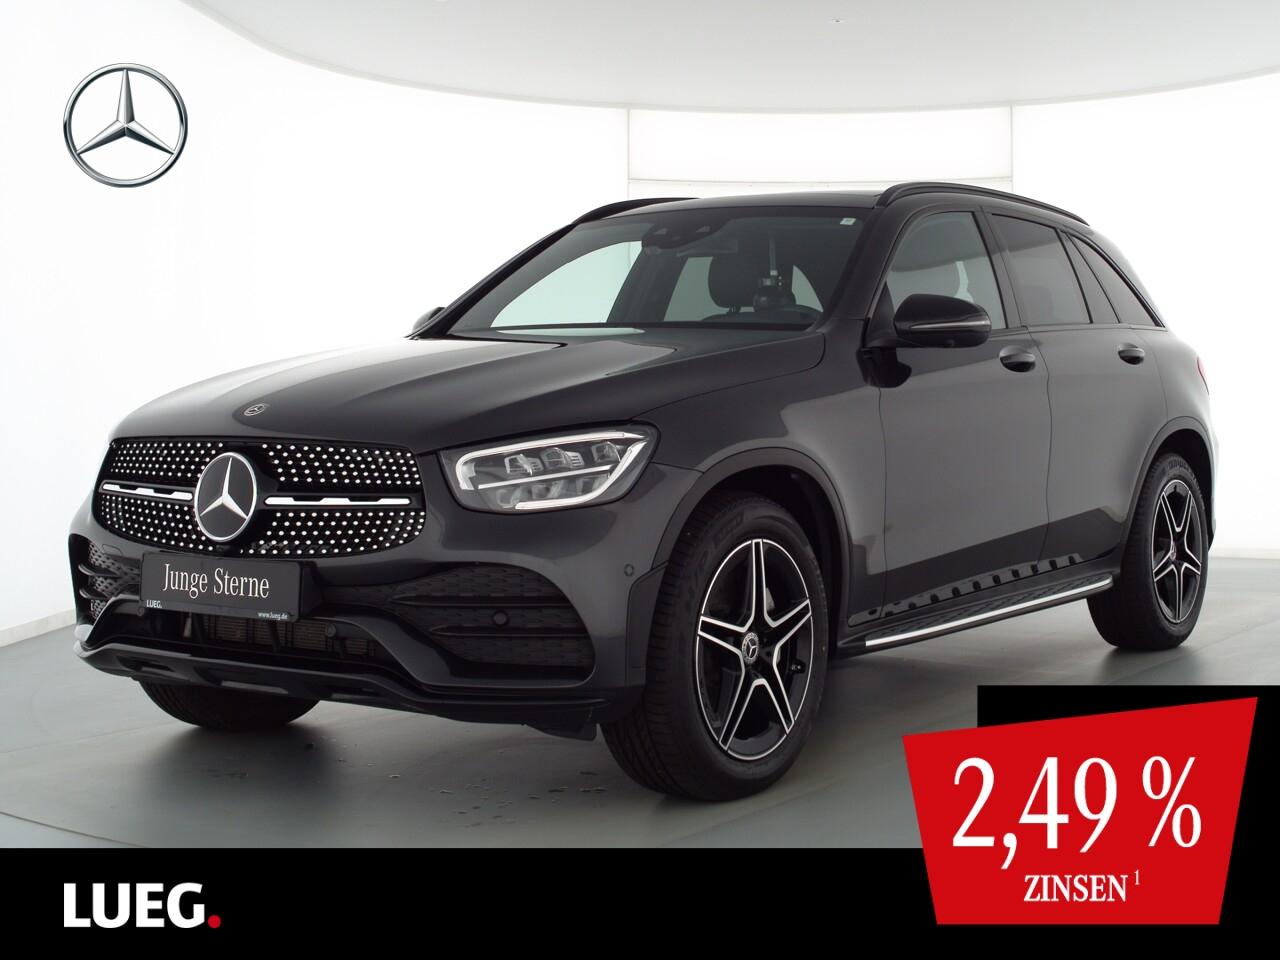 Mercedes-Benz GLC 200 4M AMG+MBUX+Navi+Pano+LED+Sthzg+AHK+360°, Jahr 2020, Benzin